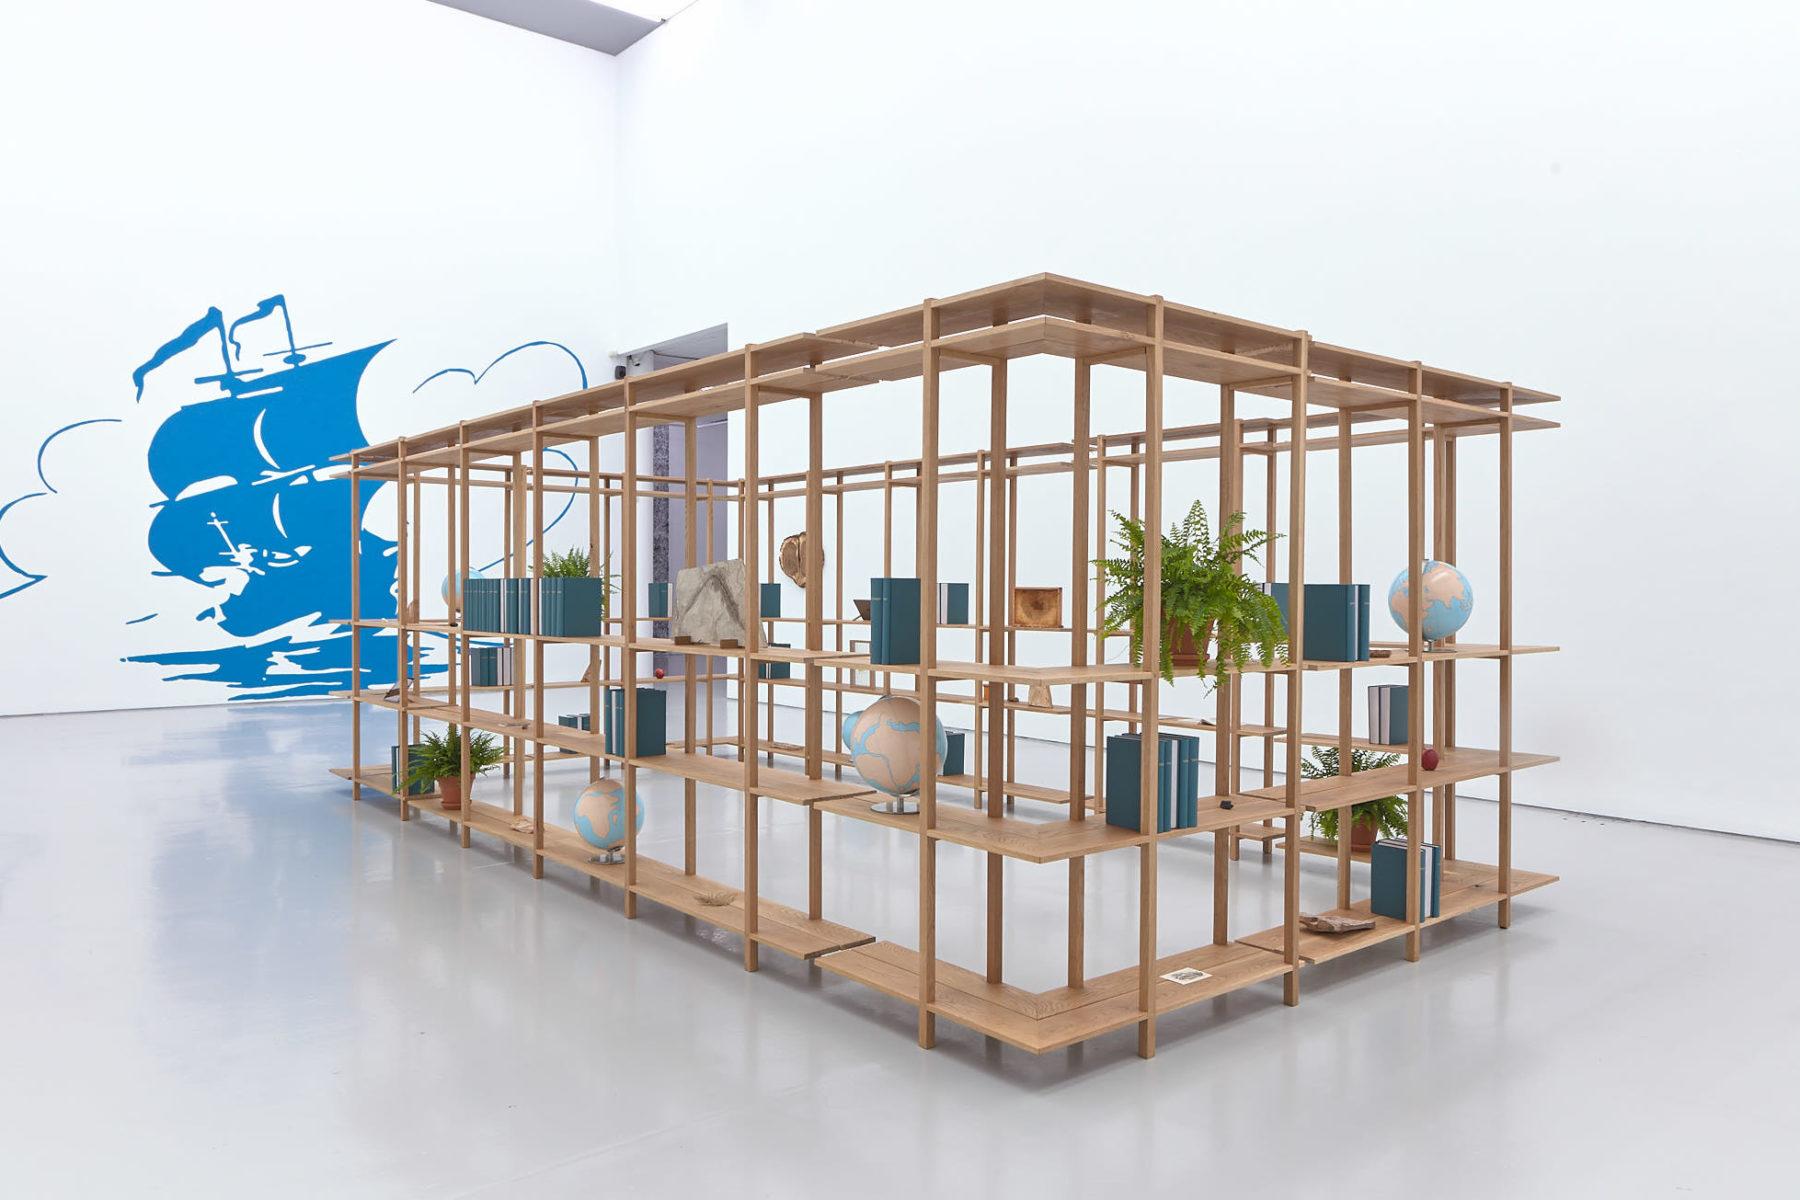 Installation view of Meriç Algün's exhibition